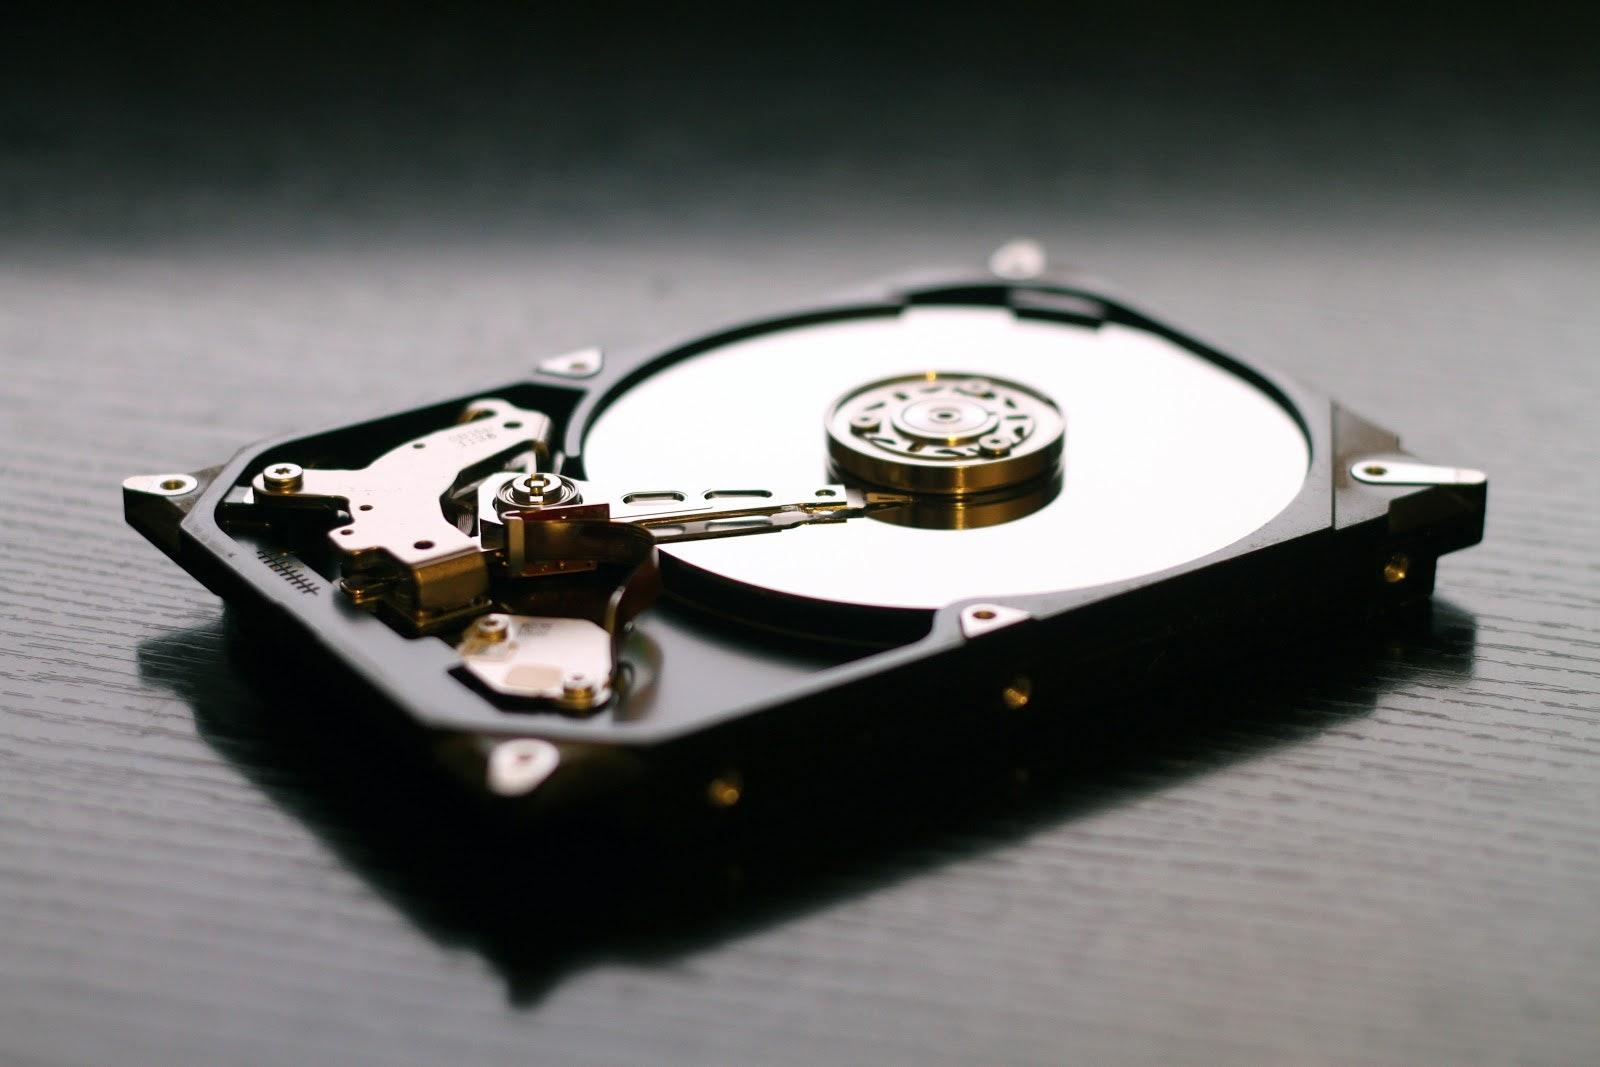 Photo of a hard drive